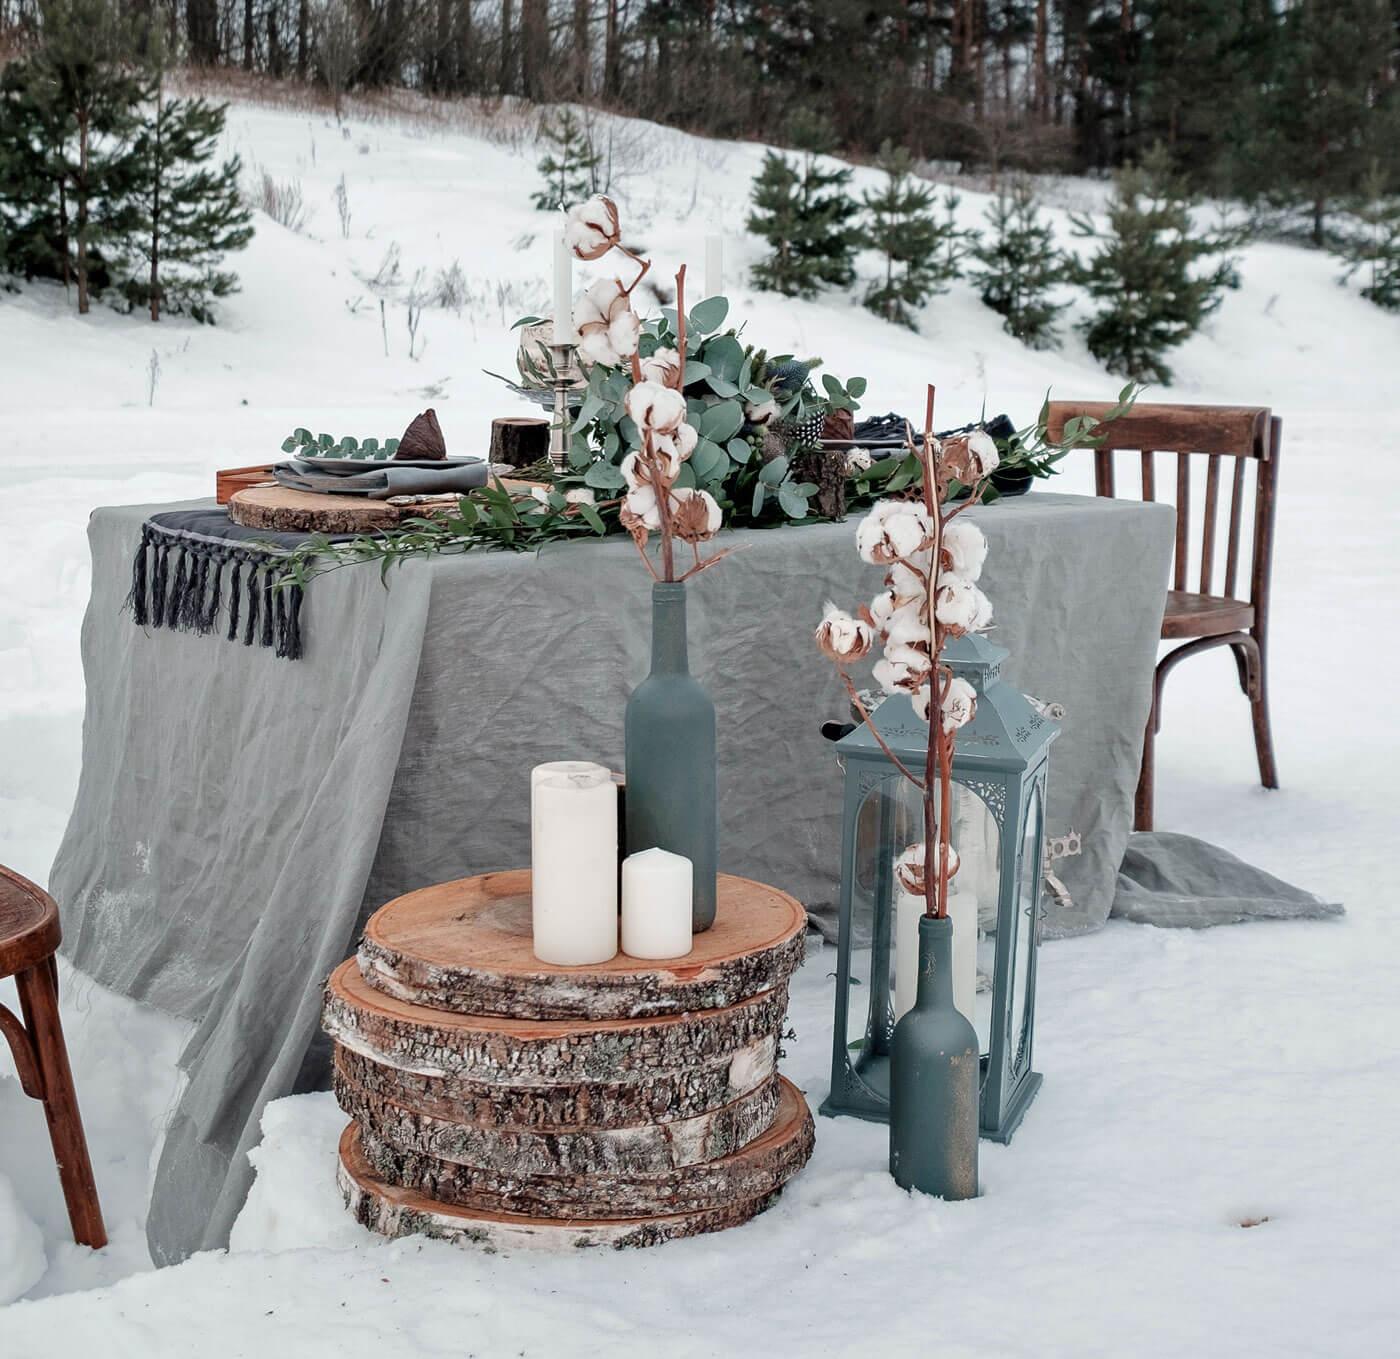 Hochzeitsdeko WinterhochzeitHochzeitsdeko Winterhochzeit